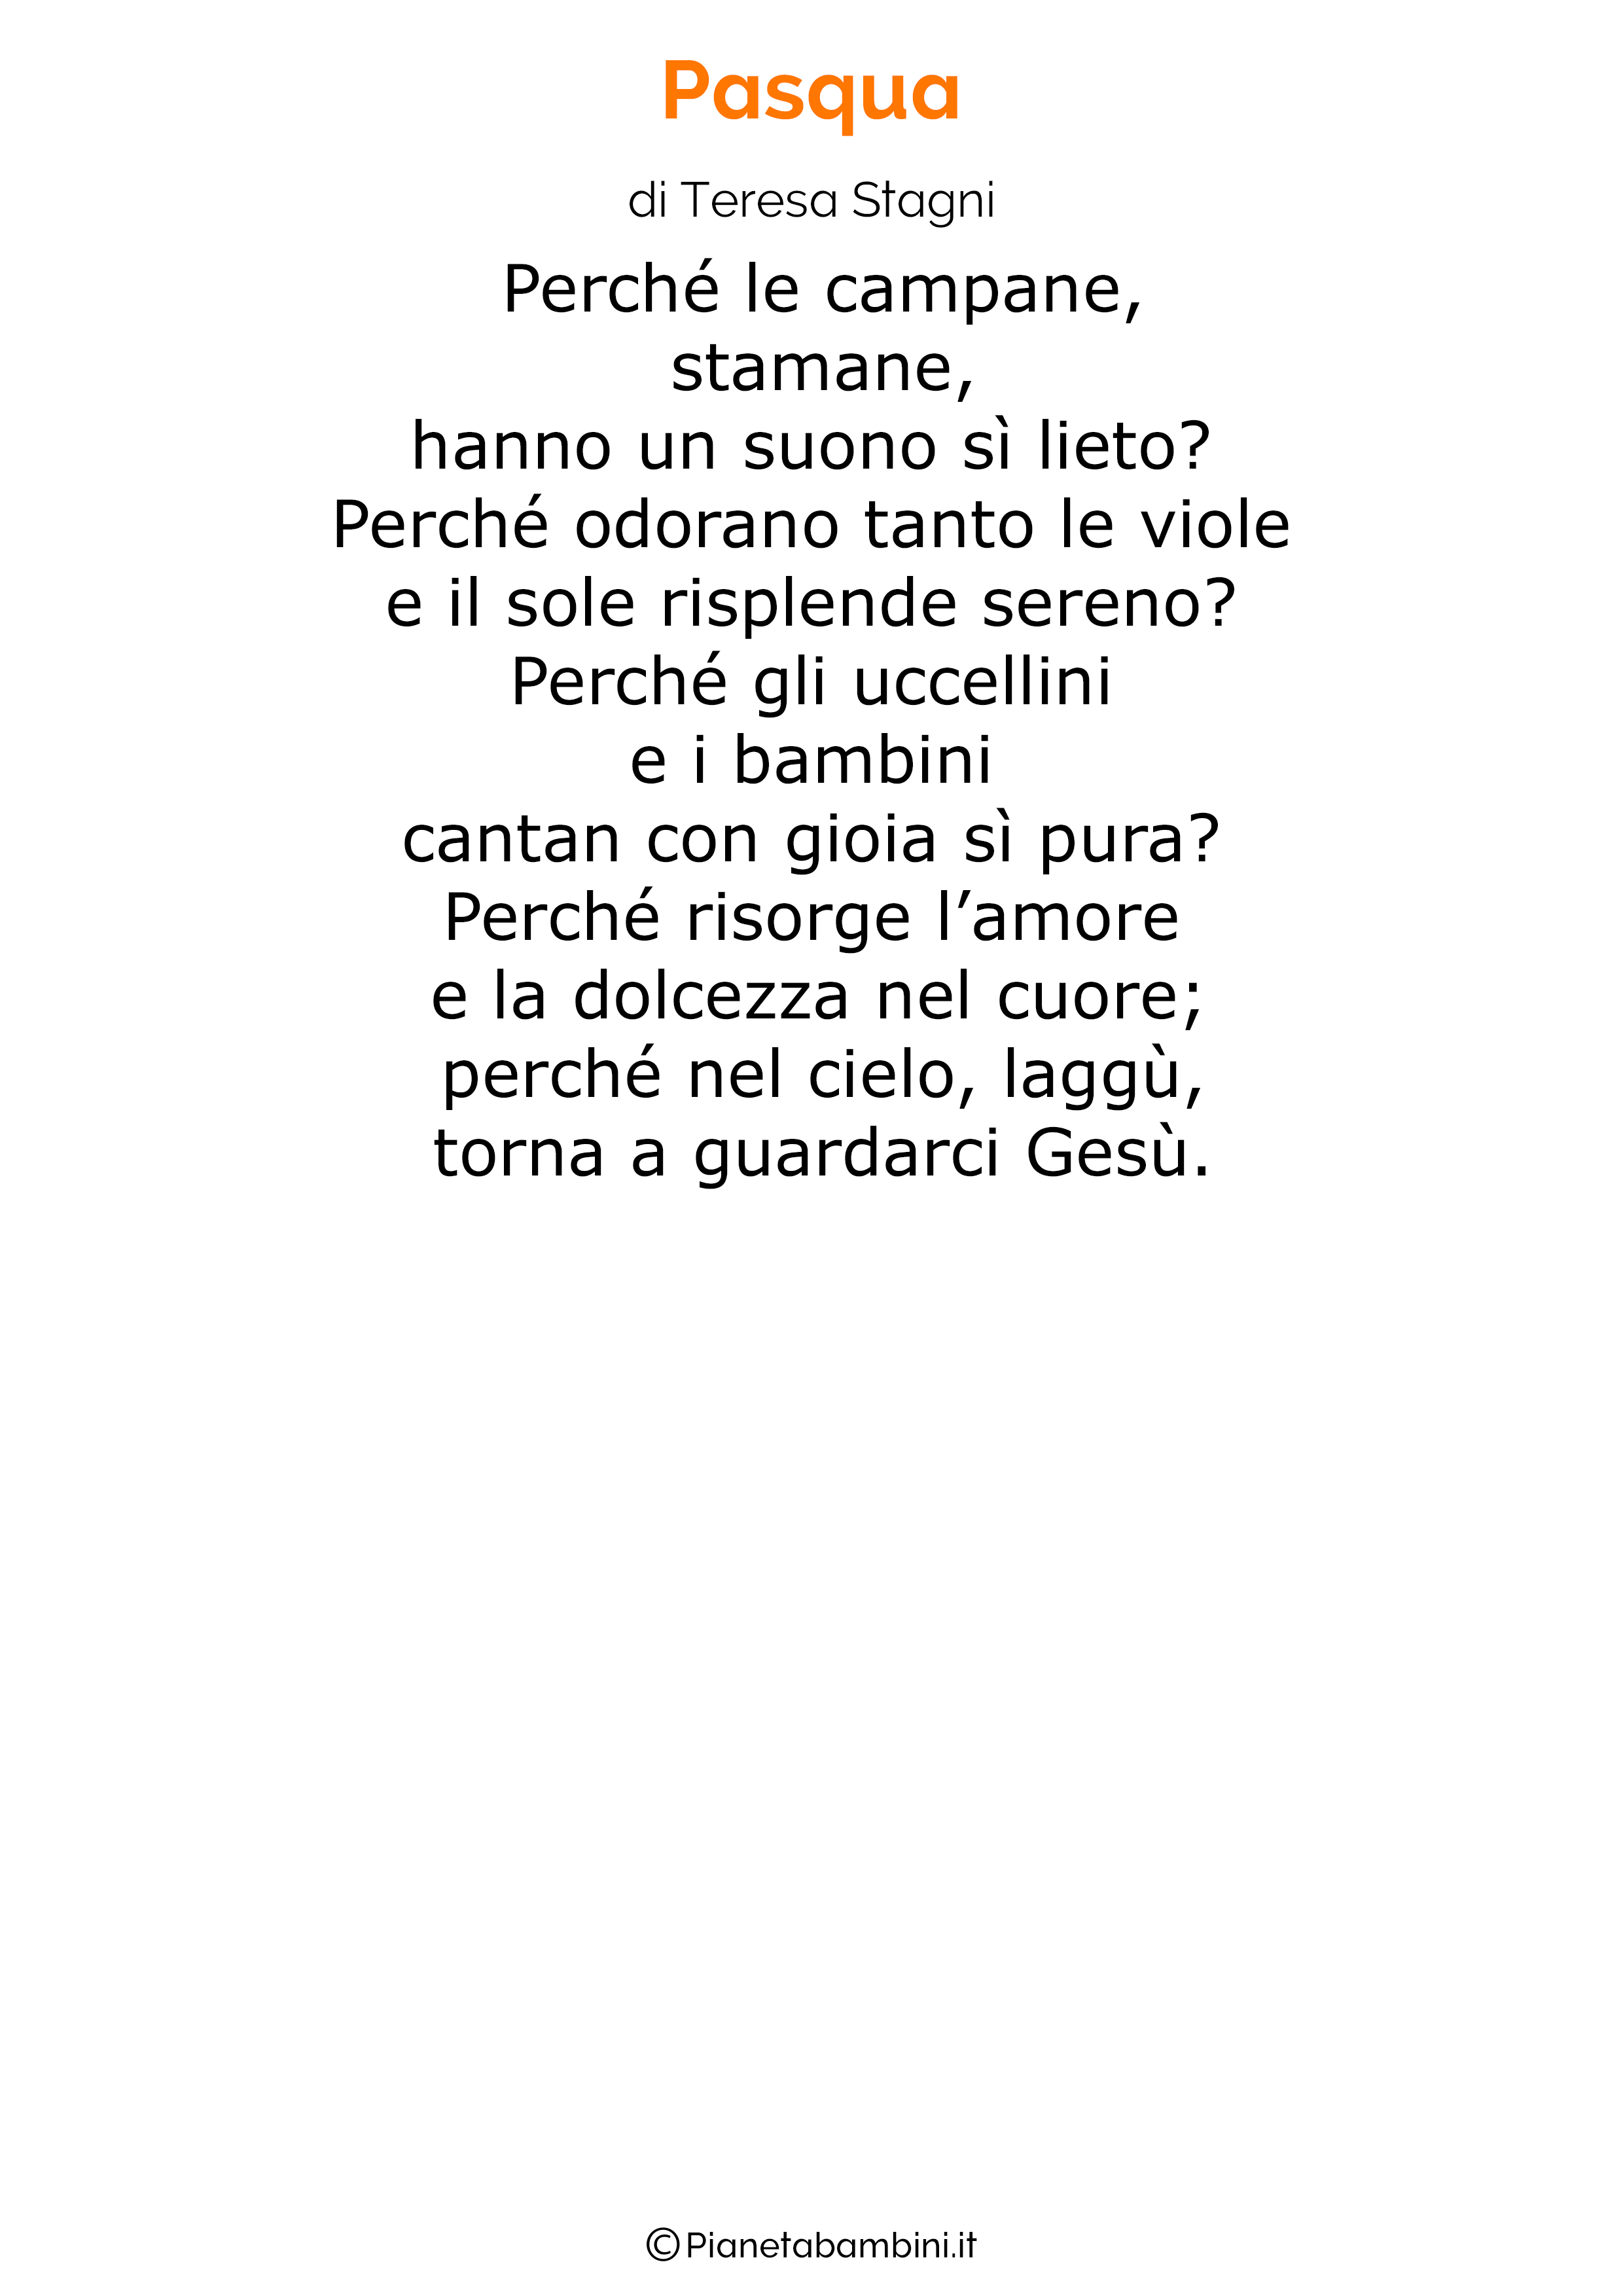 Poesia di Pasqua 34